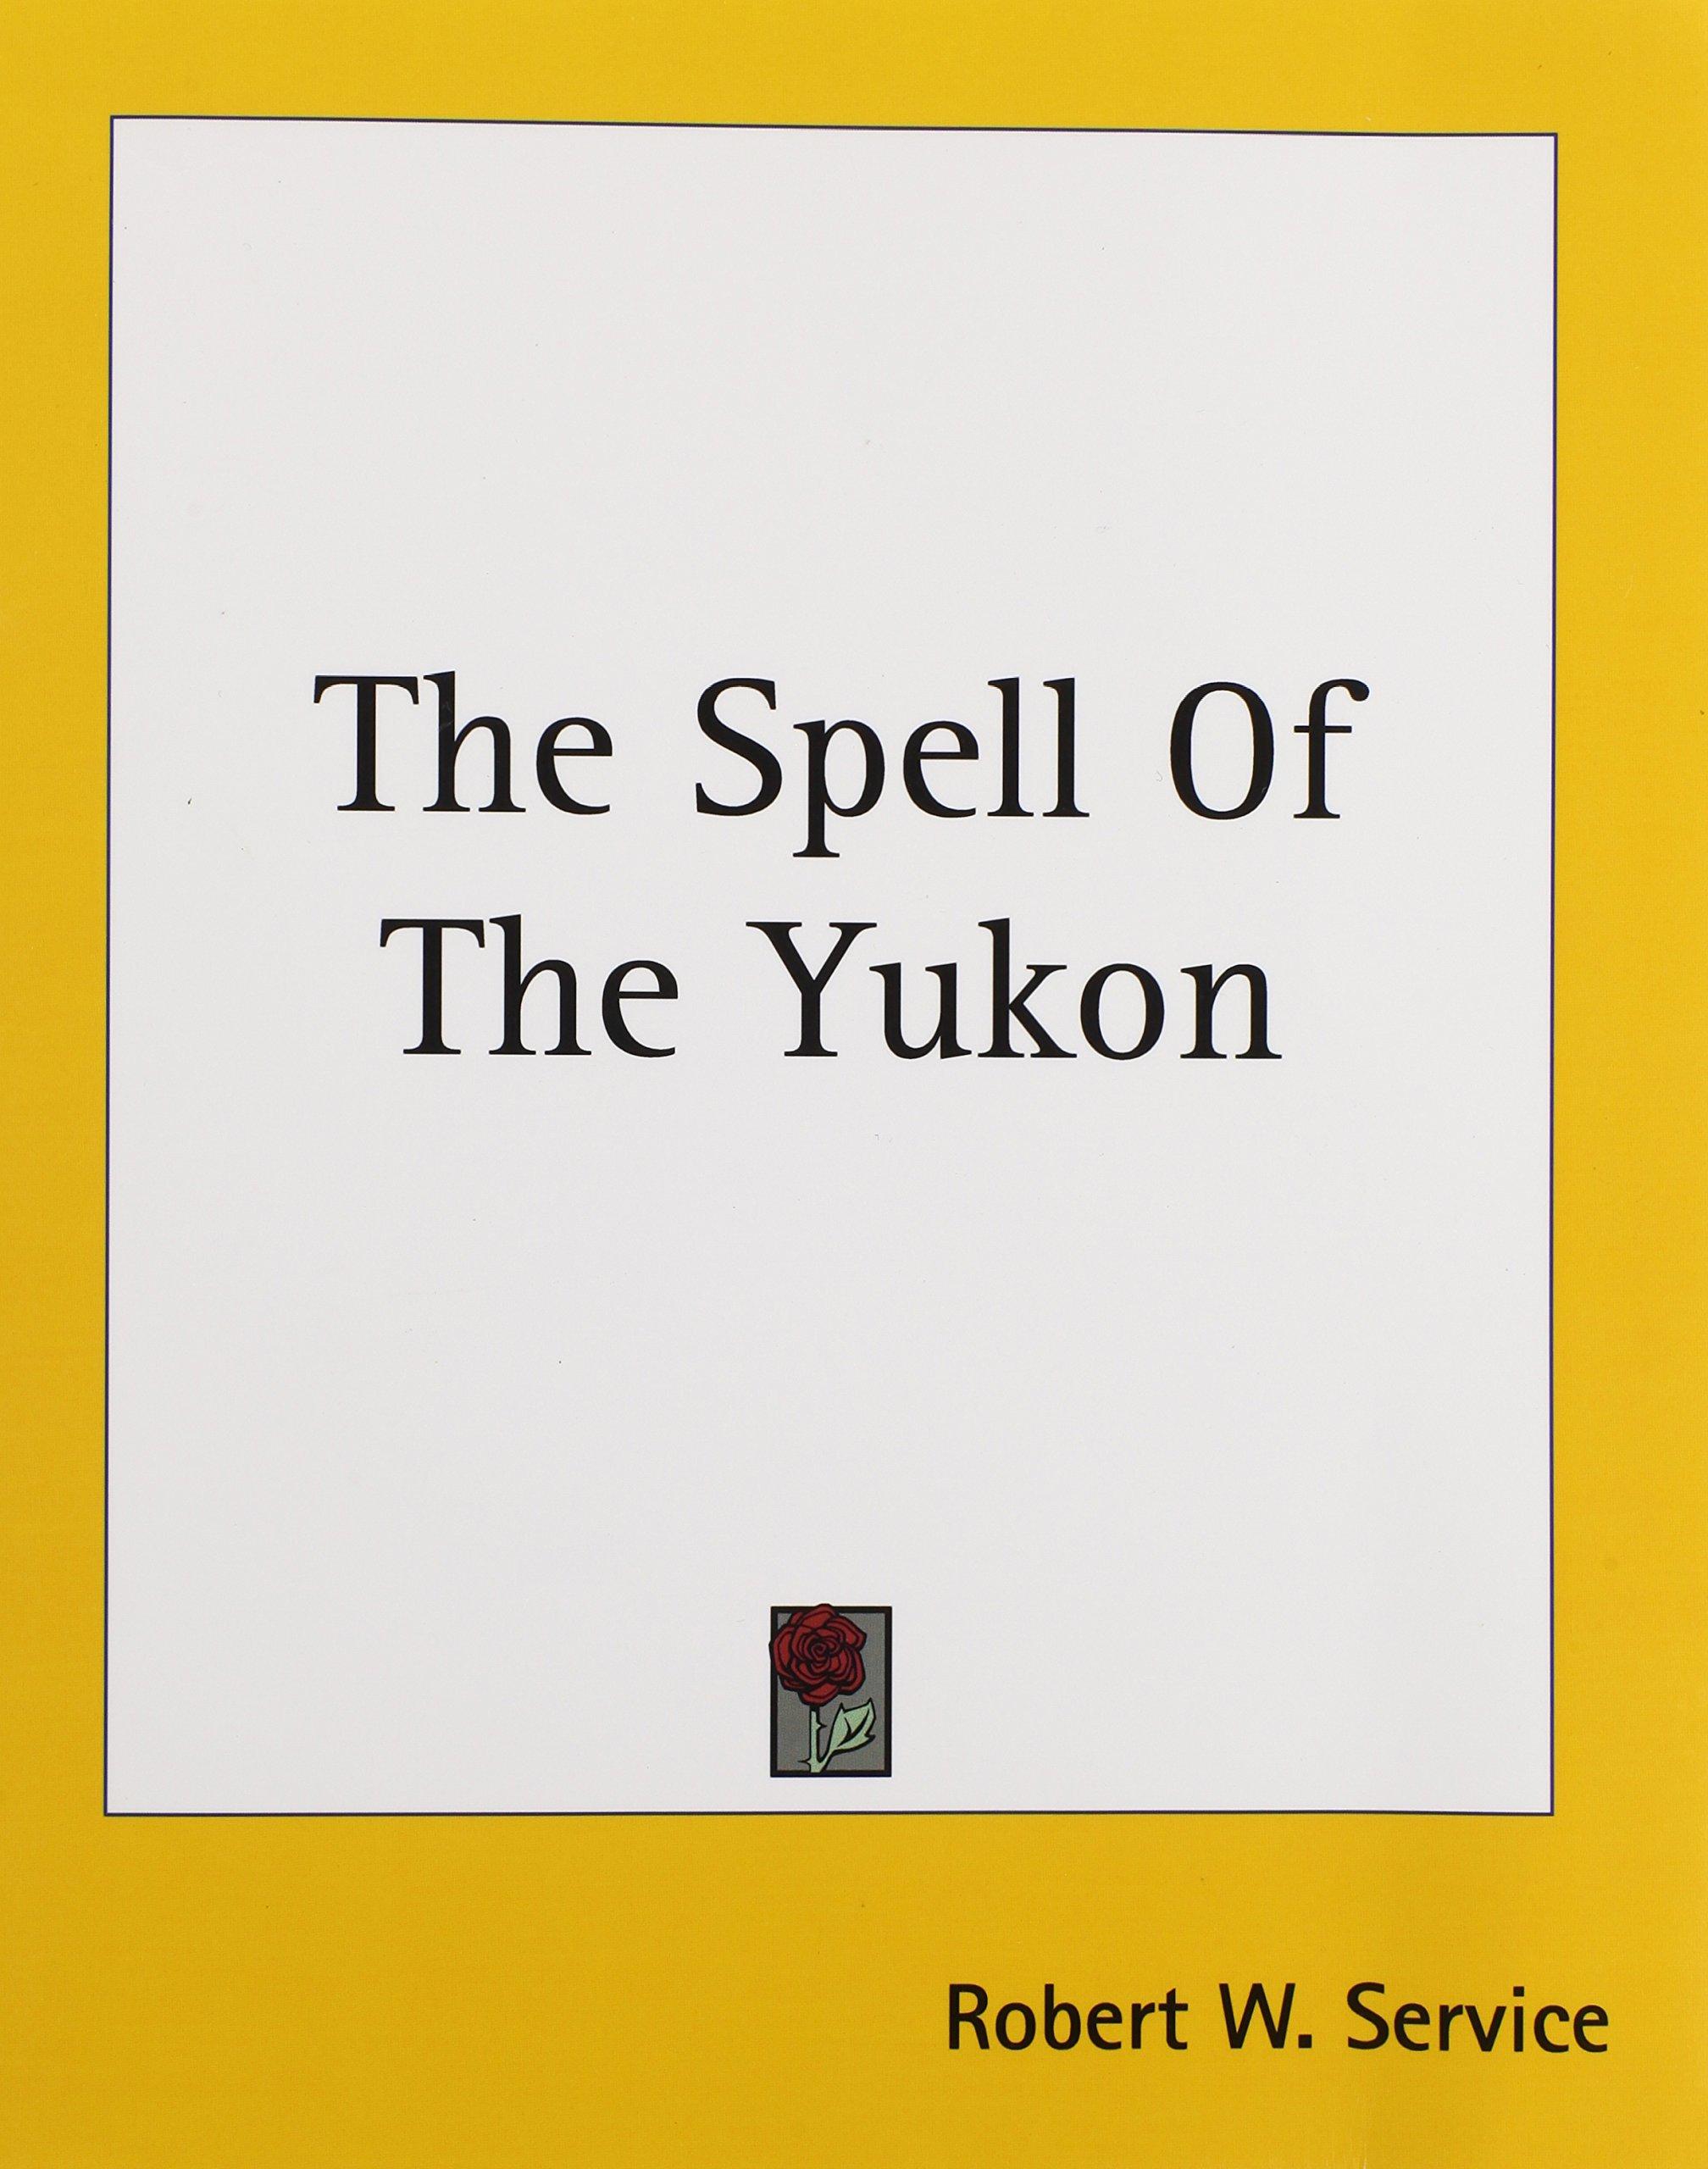 The Spell Of The Yukon: Robert W Service: 9781419183256: Amazon: Books